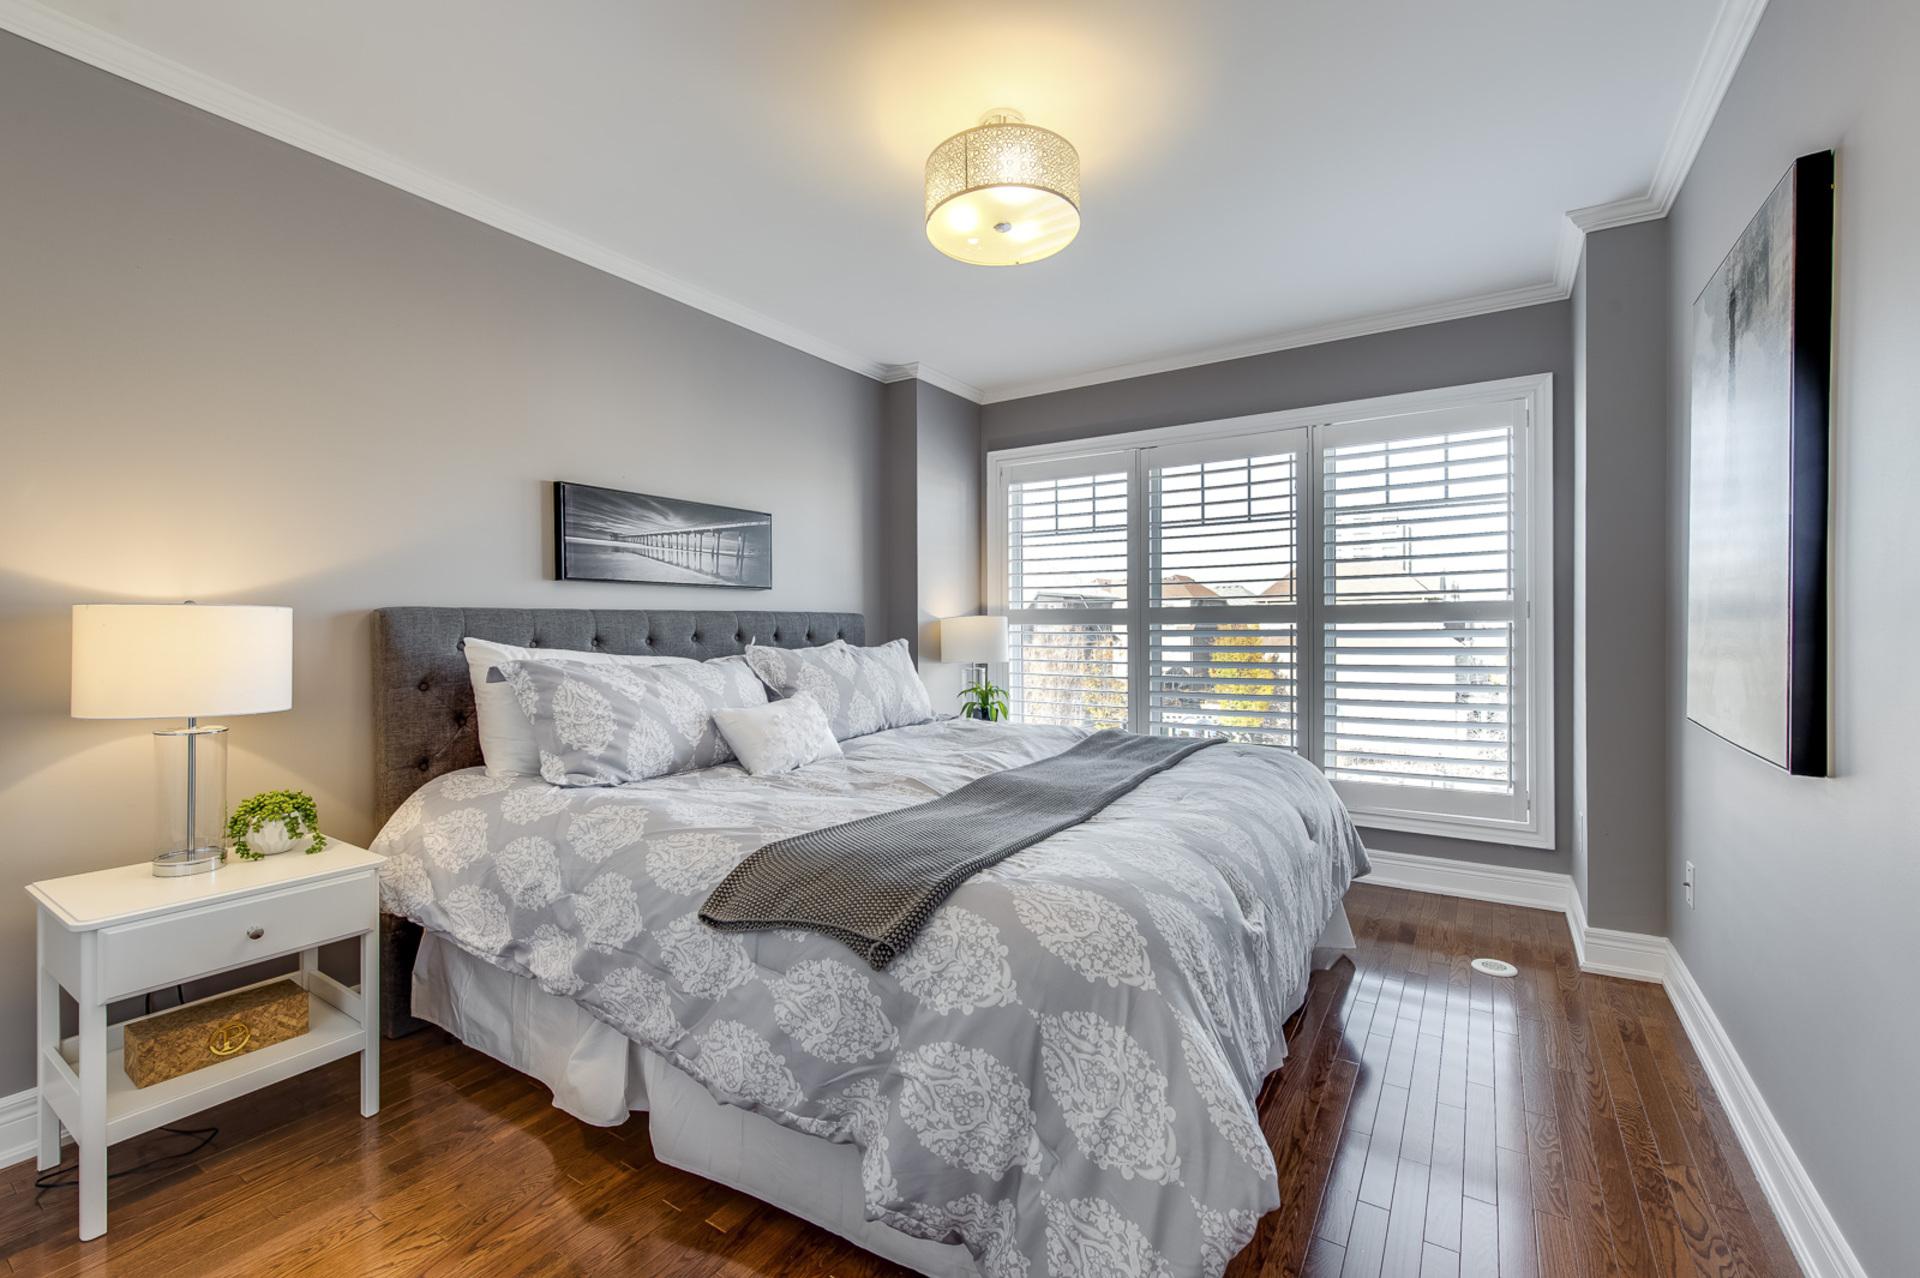 Master Bedroom - 2014 Lushes Ave, Mississauga - Elite3 & Team at 2014 Lushes Avenue, Clarkson, Mississauga